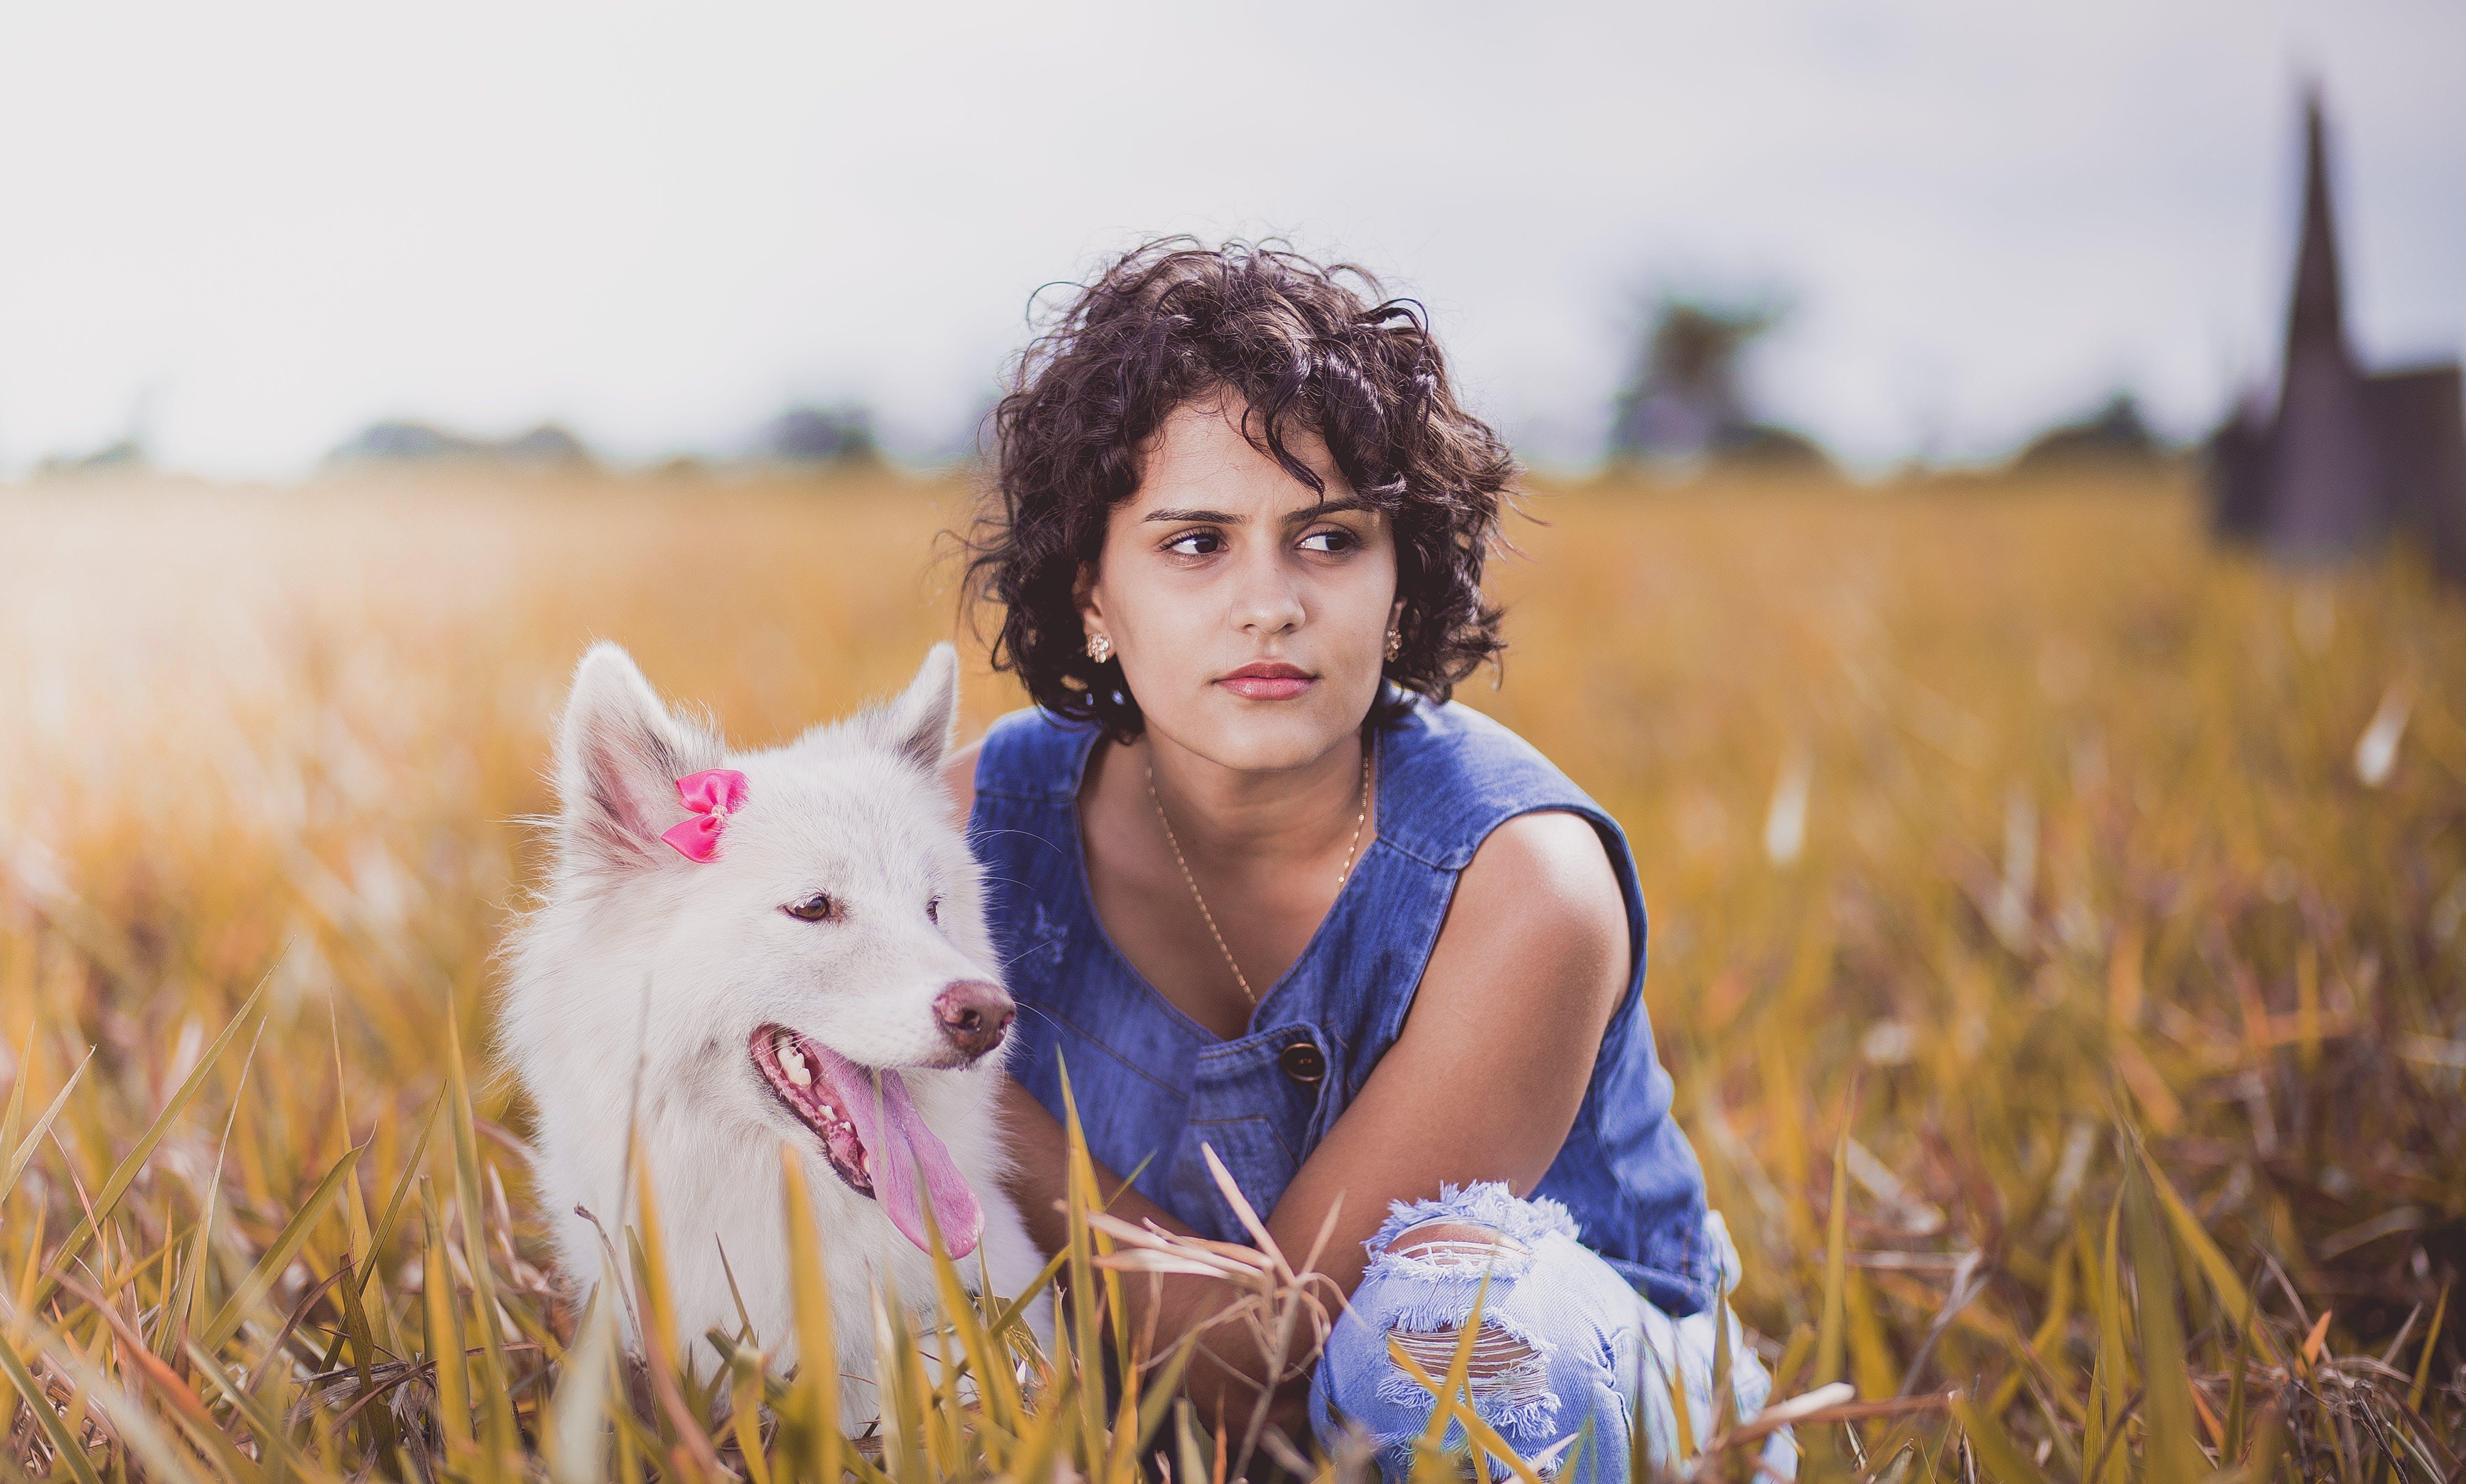 Woman Squatting Near White Dog on Grass Field